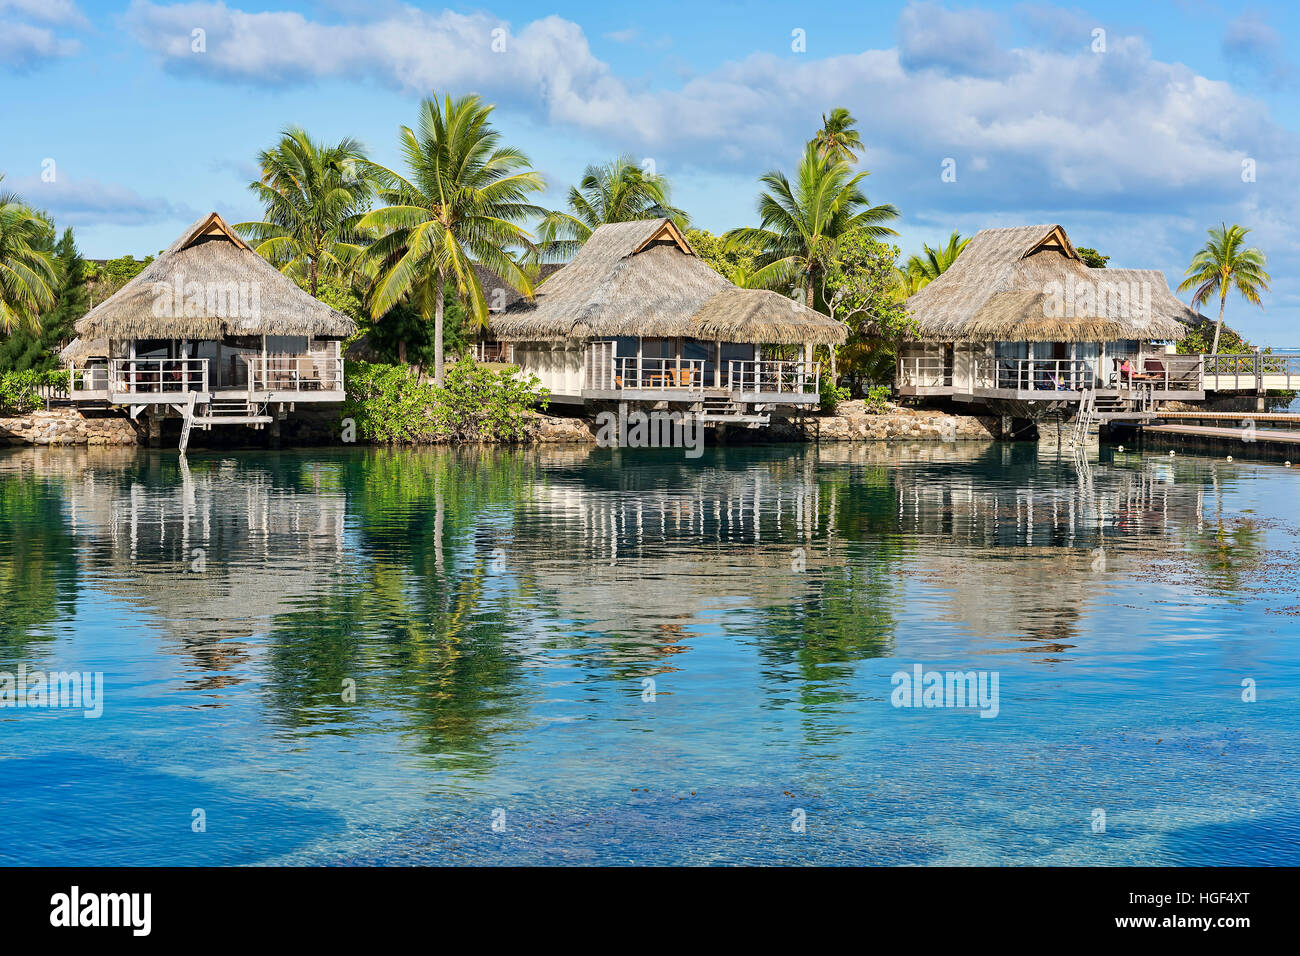 Holiday resort con bungalow, Moorea, Polinesia Francese Immagini Stock